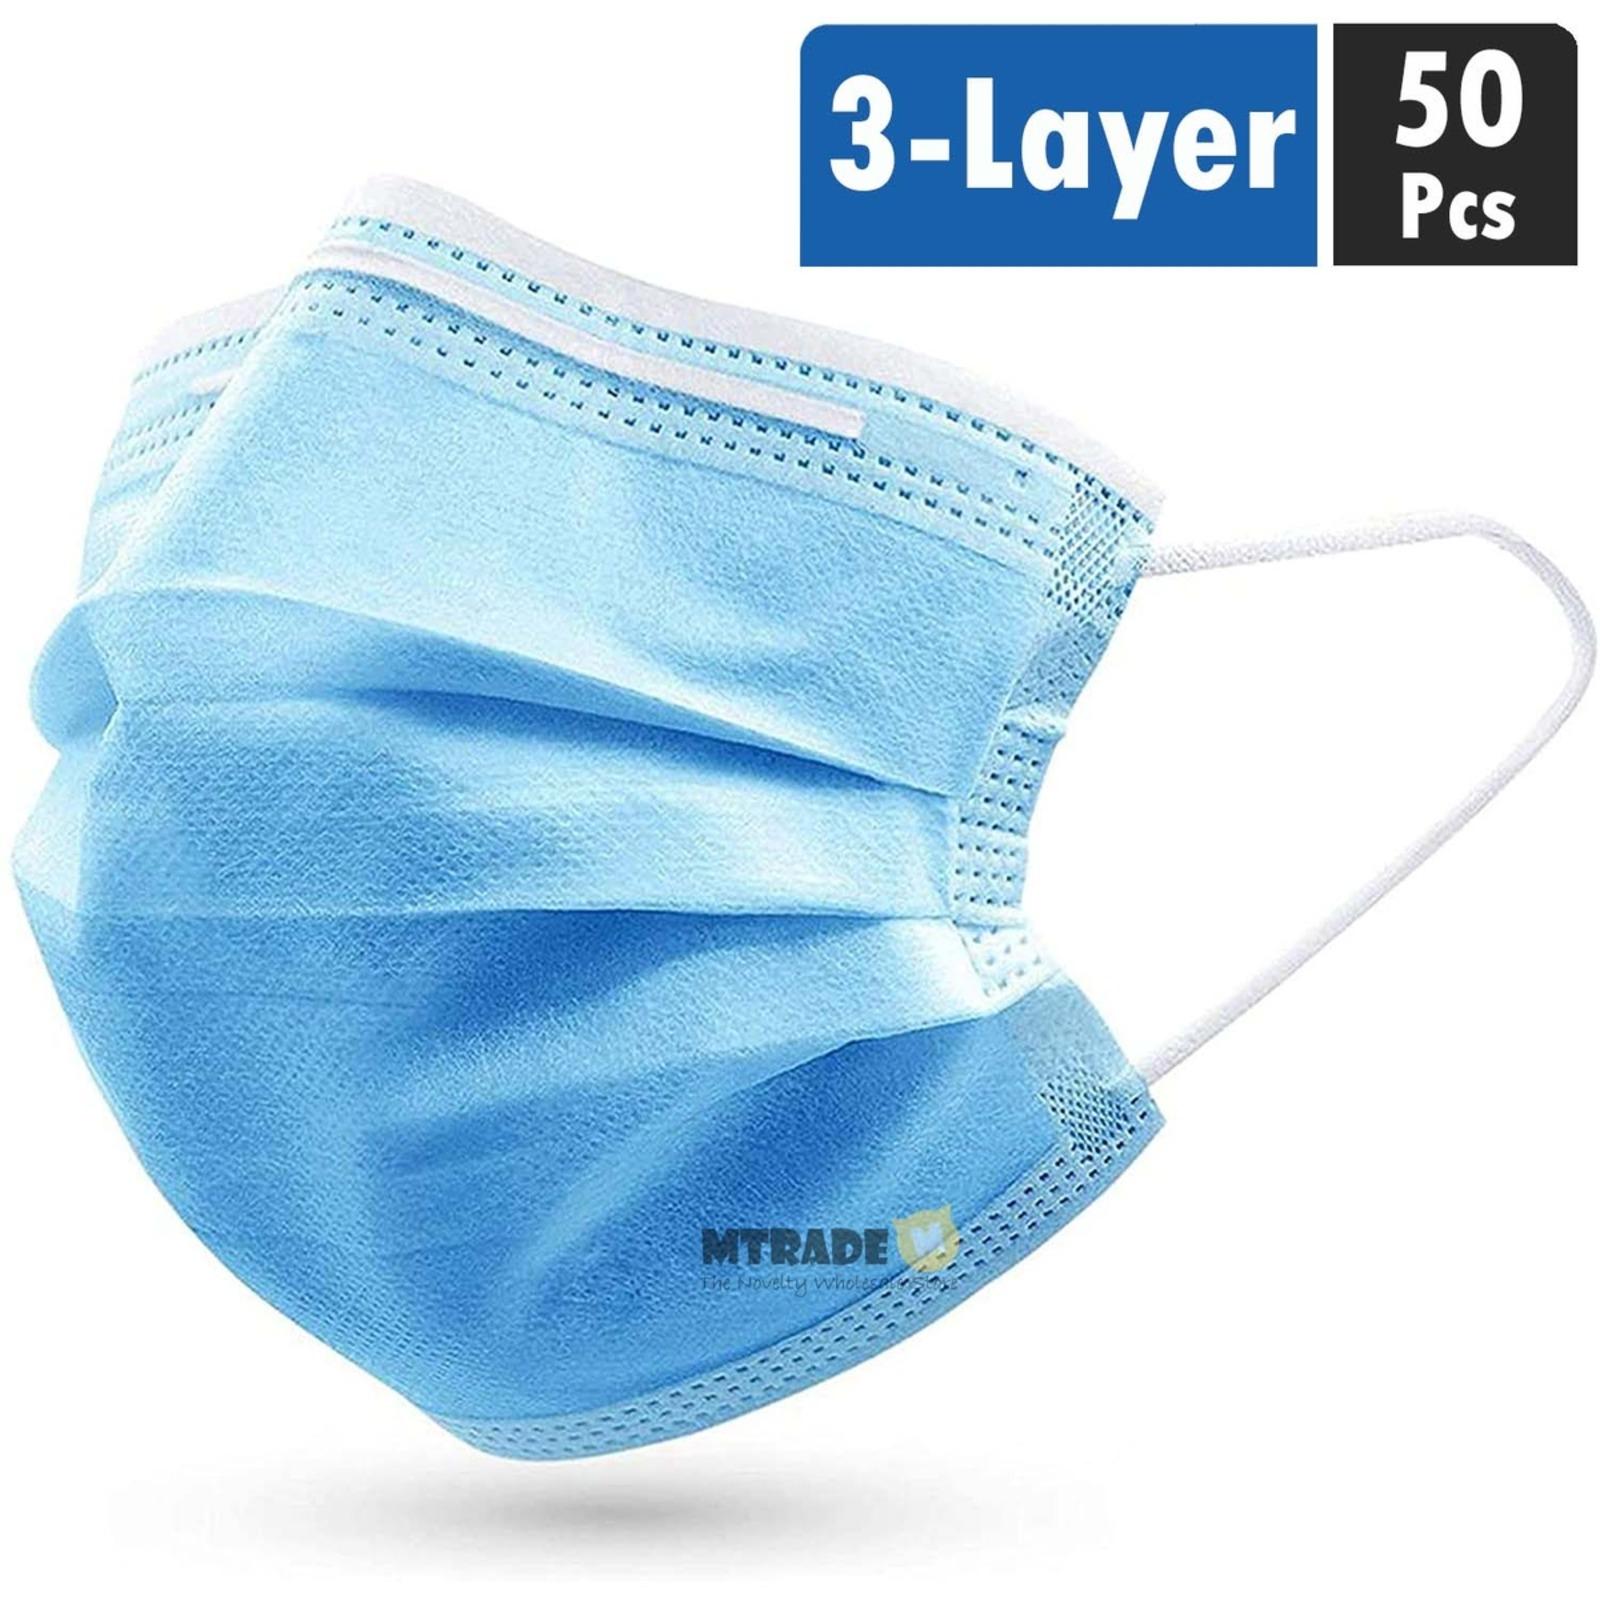 MTRADE 3-Layer Disposable Face Mask